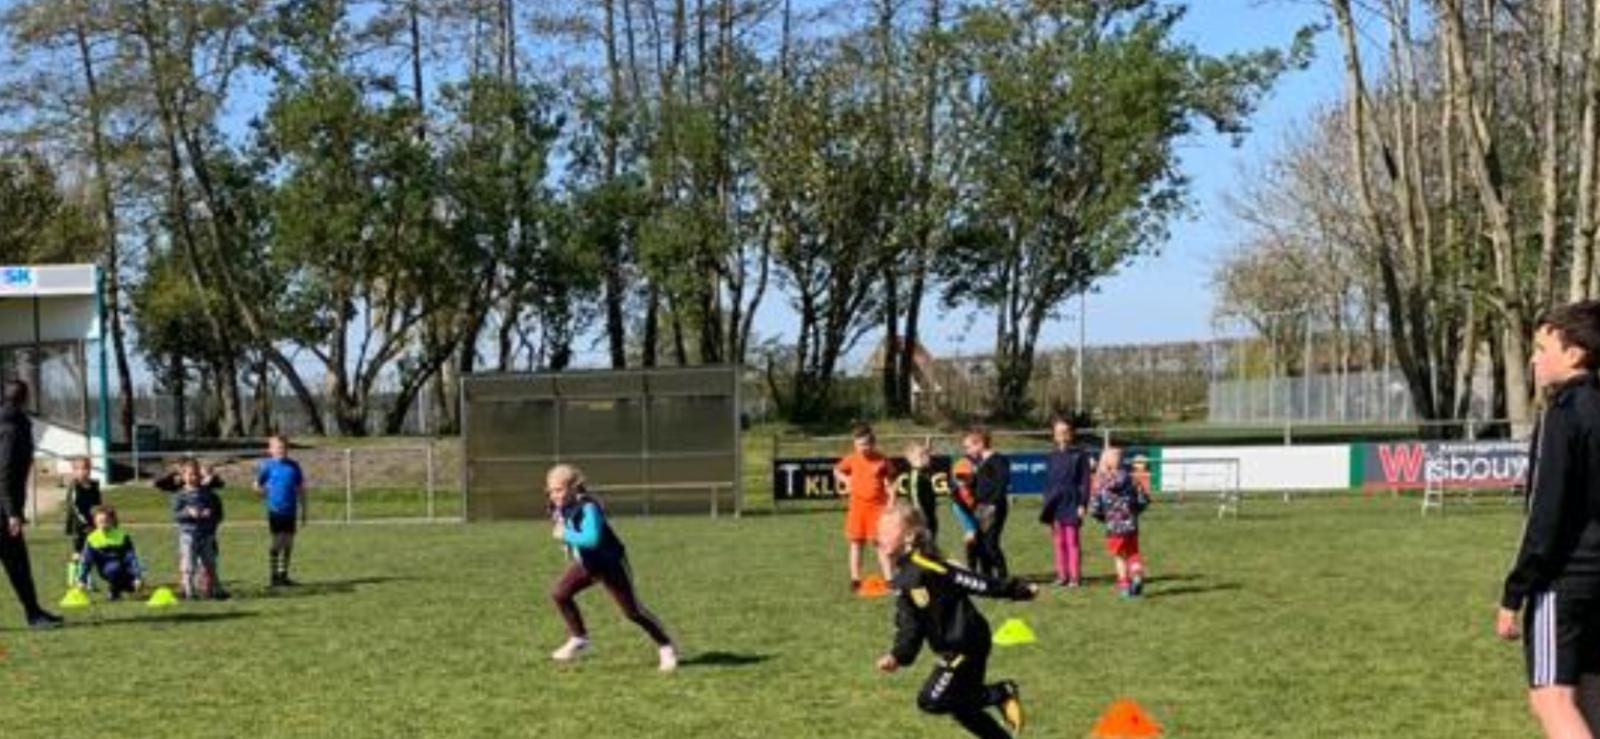 Regiocup start op zaterdag 5 Juni